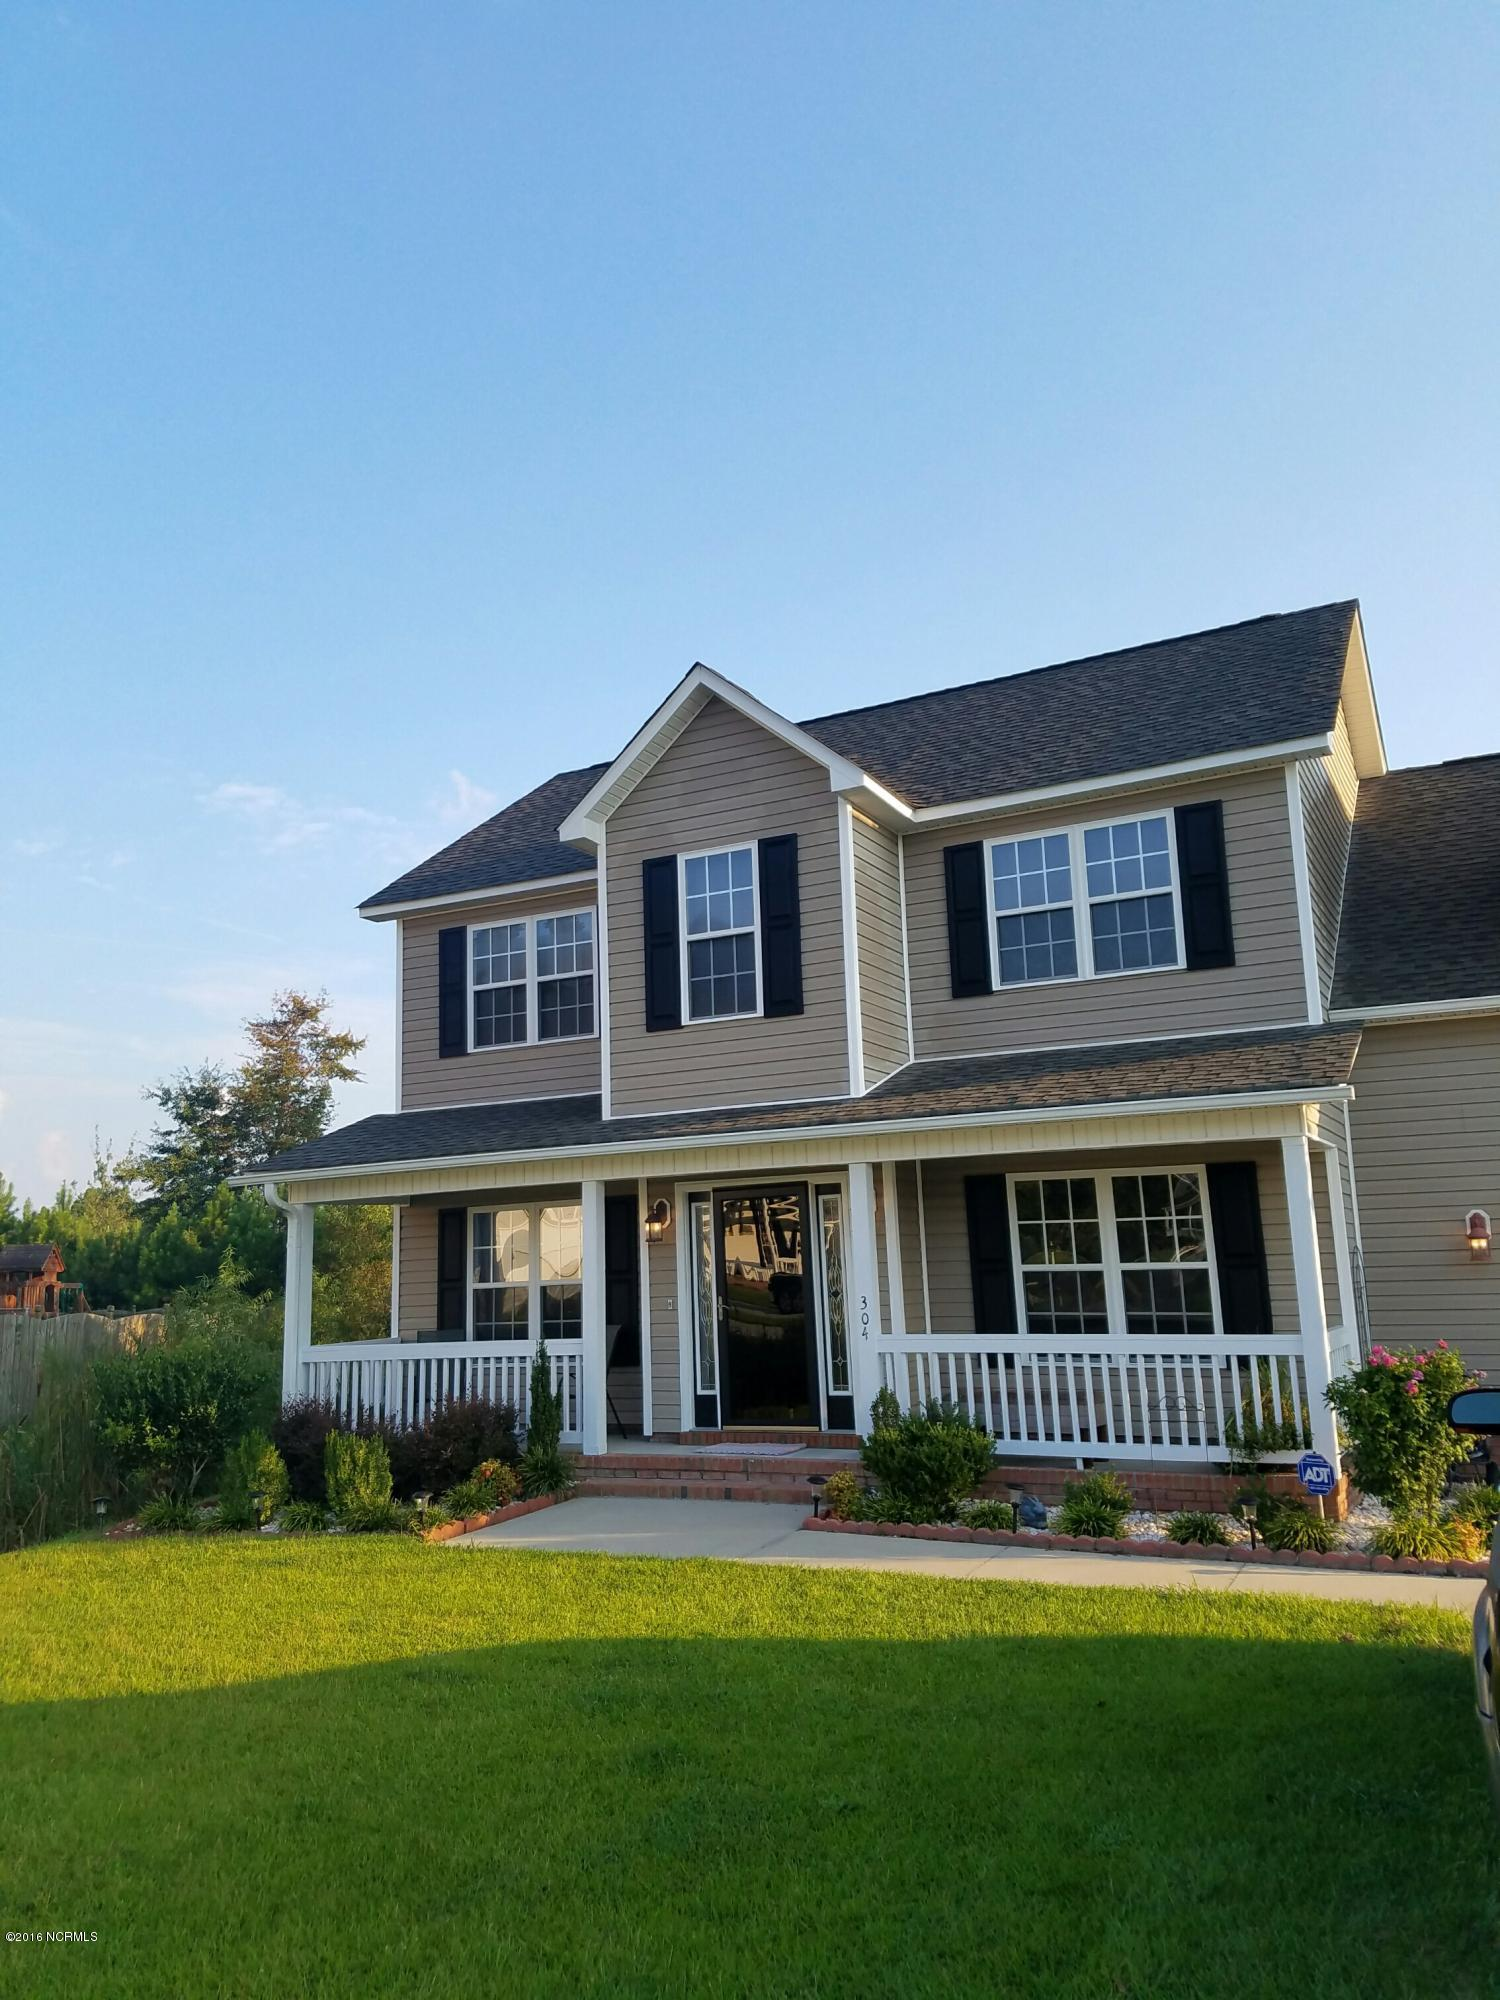 304 Honey Court West Drive, Jacksonville, North Carolina 28540, 4 Bedrooms Bedrooms, ,2 BathroomsBathrooms,Residential,For Sale,Honey Court West,11501466